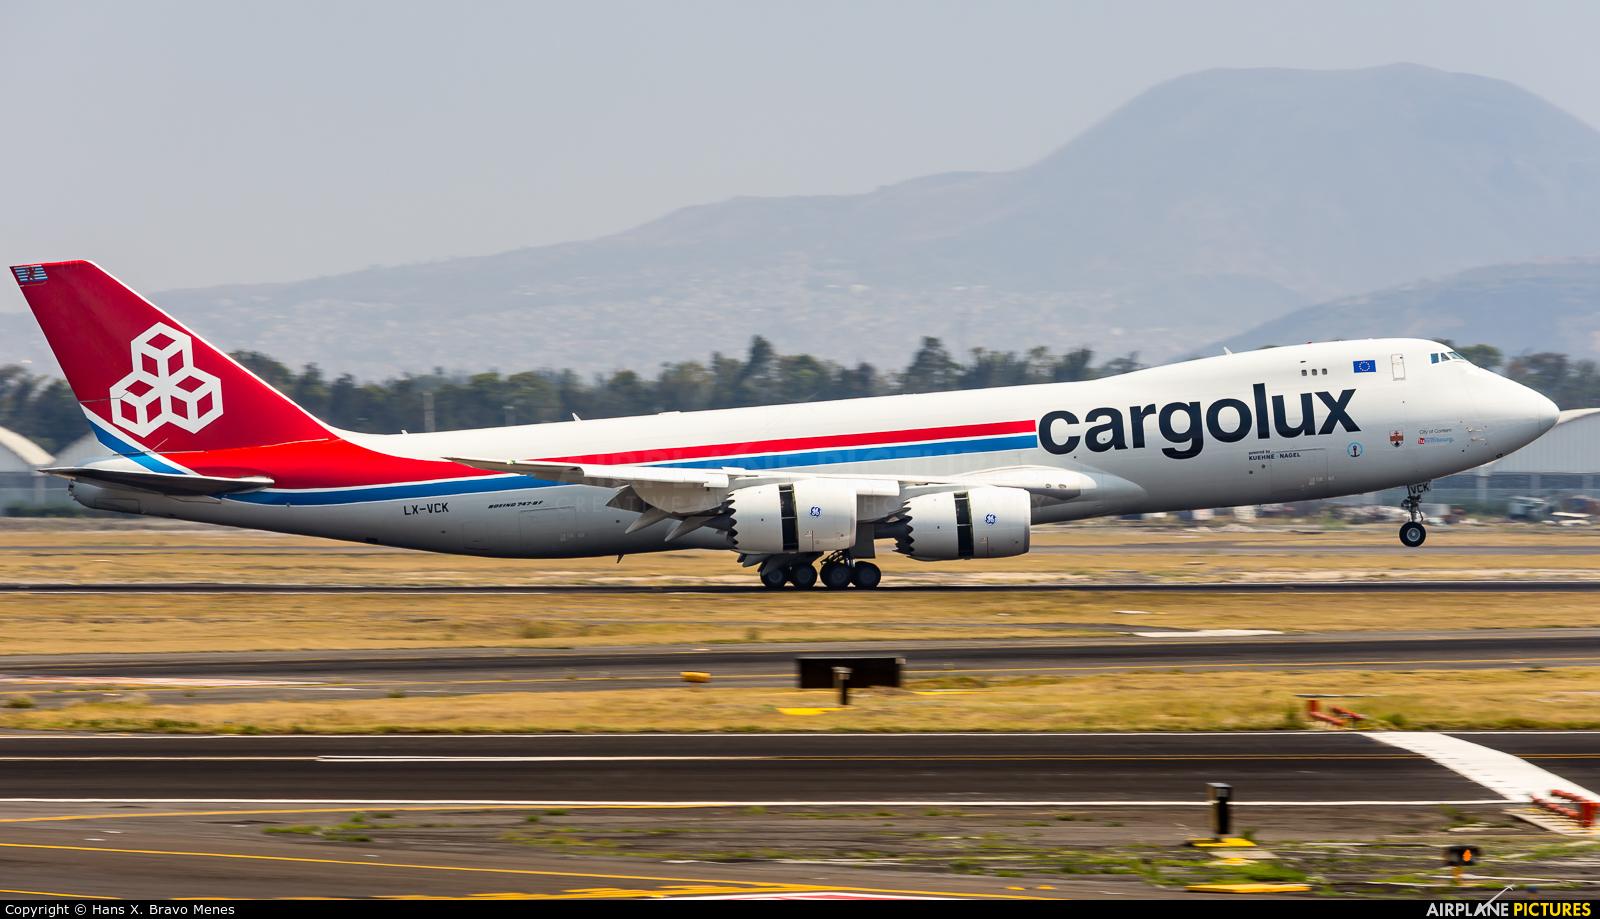 Cargolux LX-VCK aircraft at Mexico City - Licenciado Benito Juarez Intl